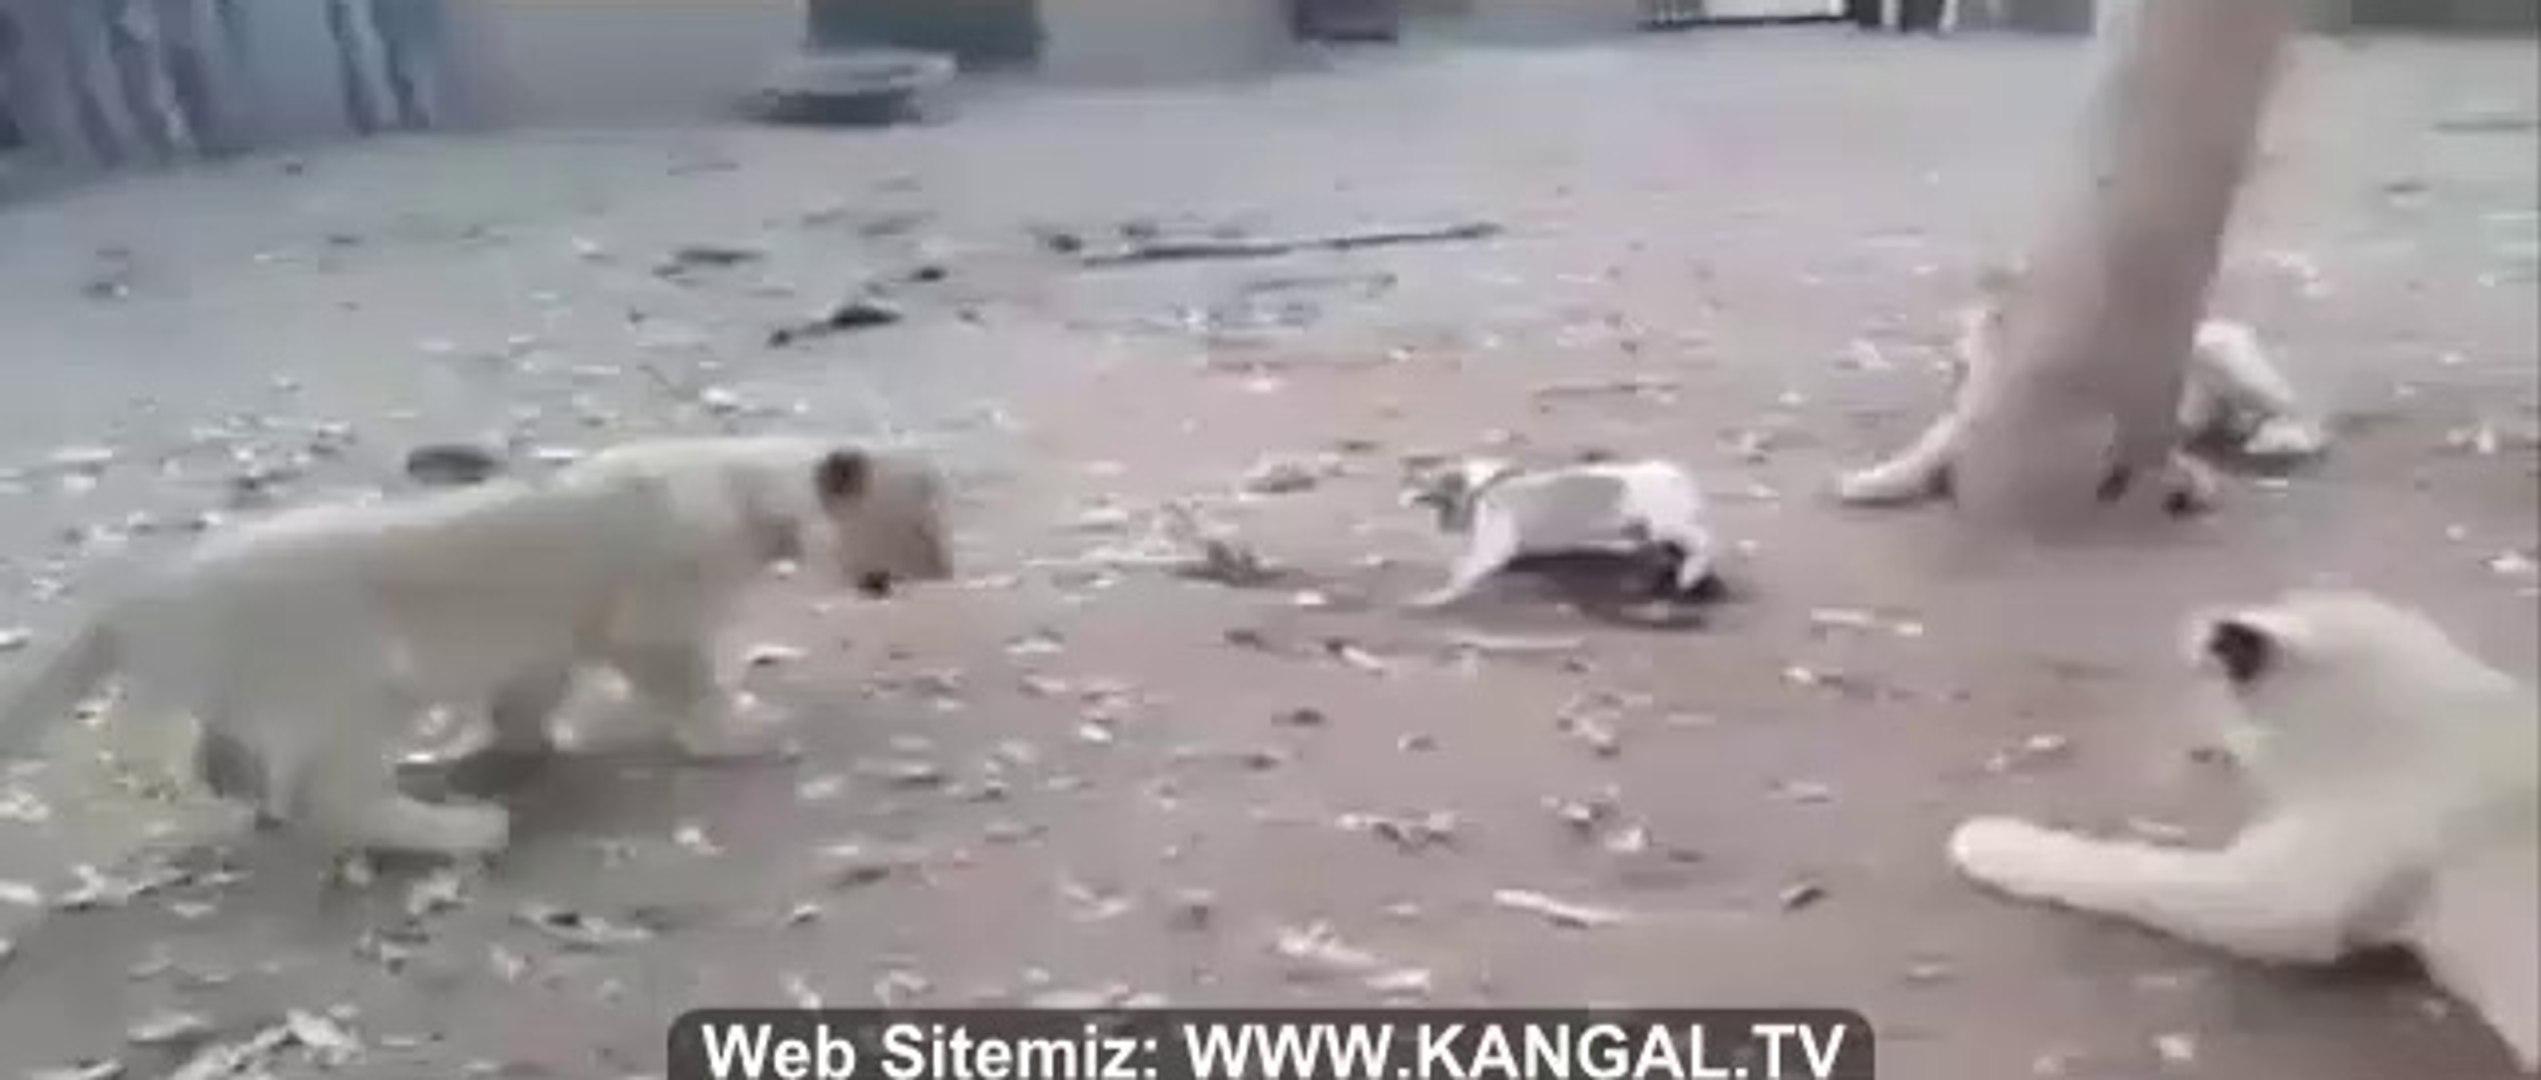 3 ASLAN vs 1 SUS KOPEGi - 3 LiON vs 1 FANCY DOG